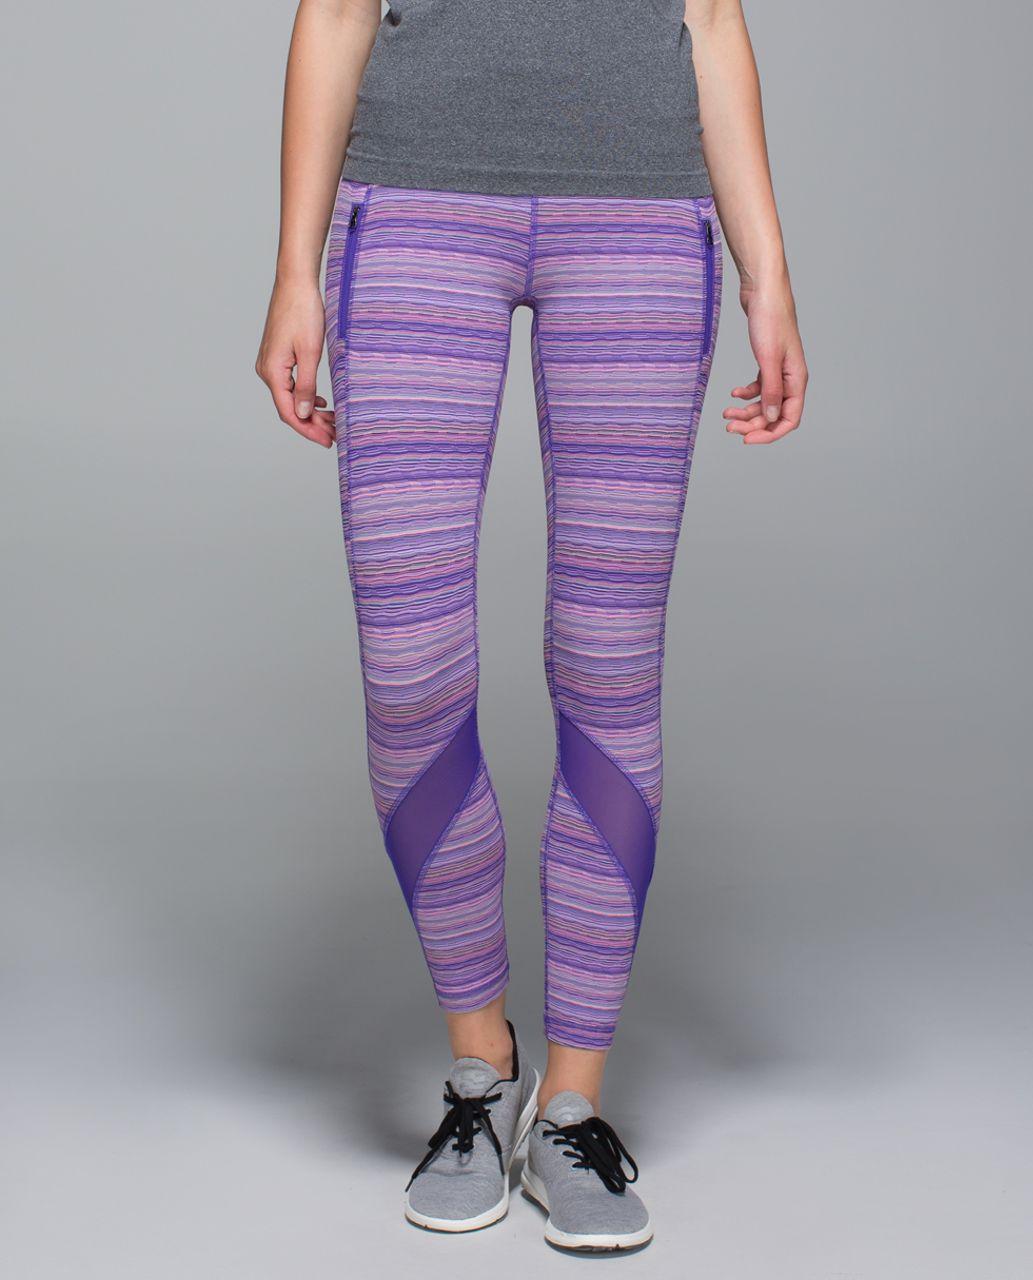 Lululemon Inspire Tight II (Mesh) - Space Dye Twist Iris Flower Pink Shell / Iris Flower